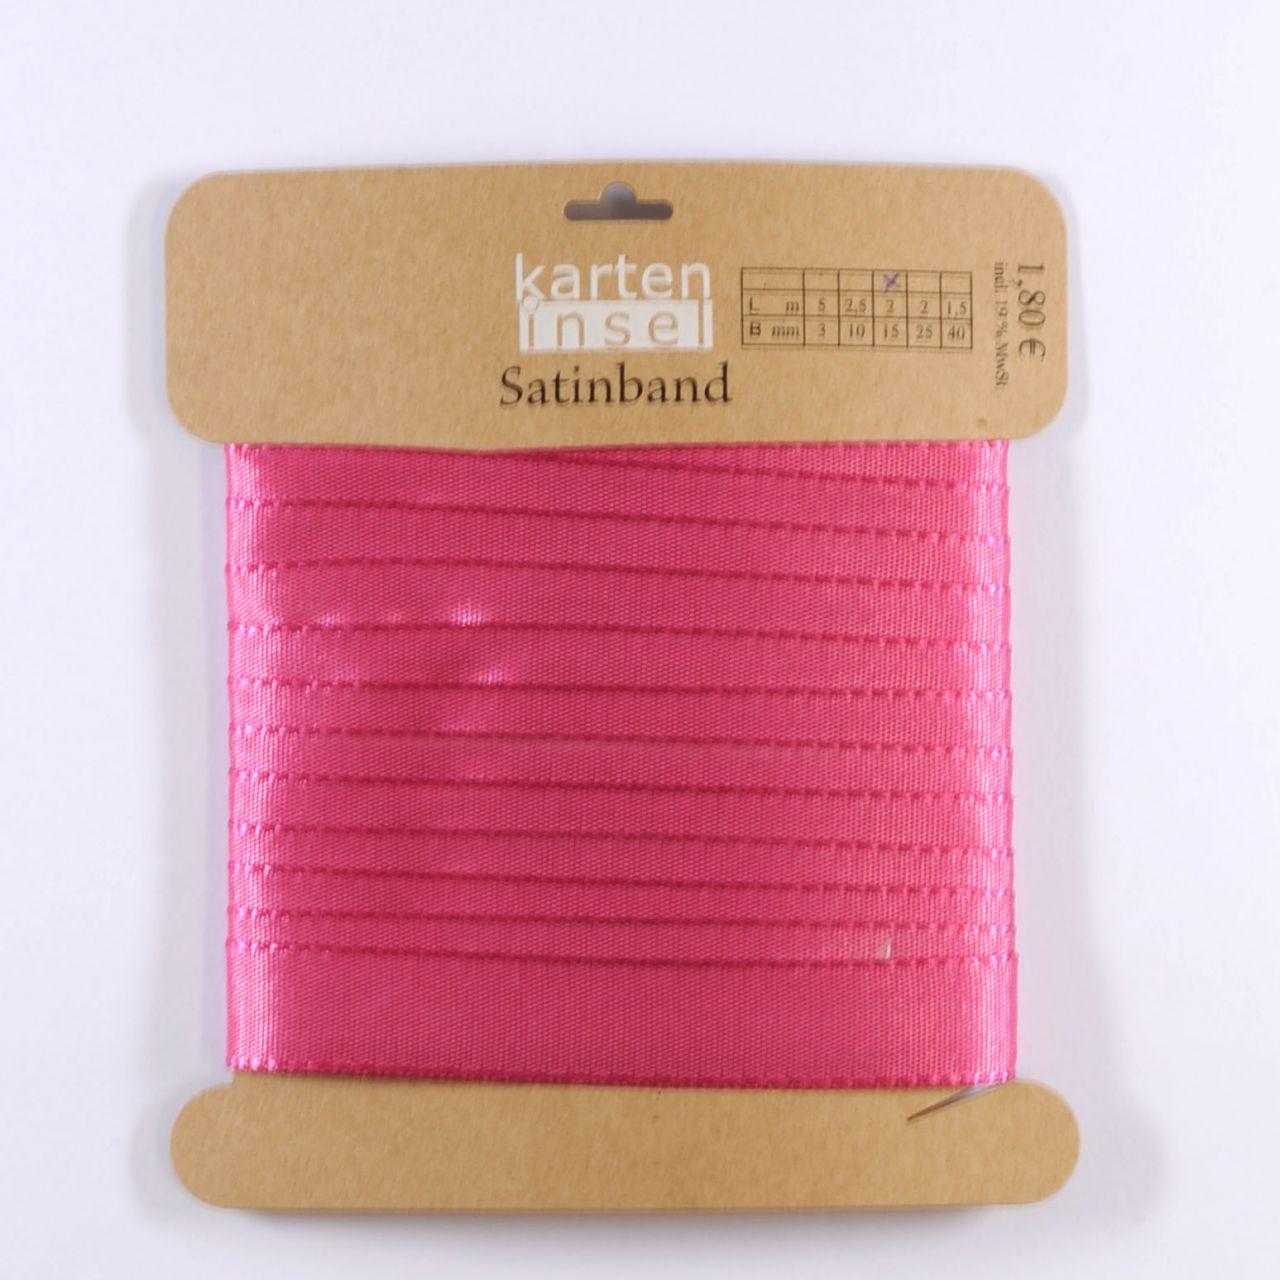 Satinband pink - 15 mm - 2 m